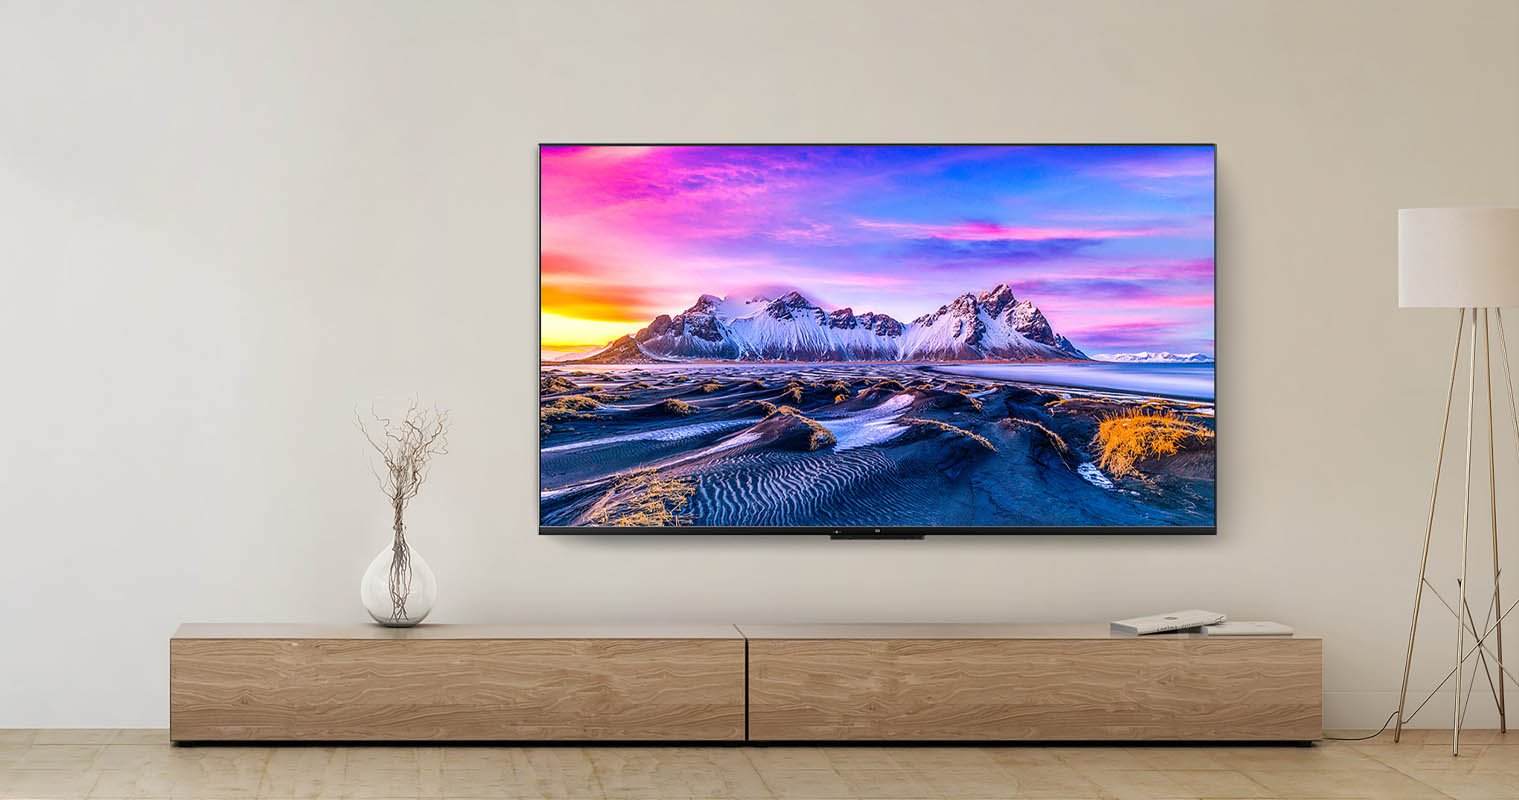 diseño Xiaomi Mi TV Q1E